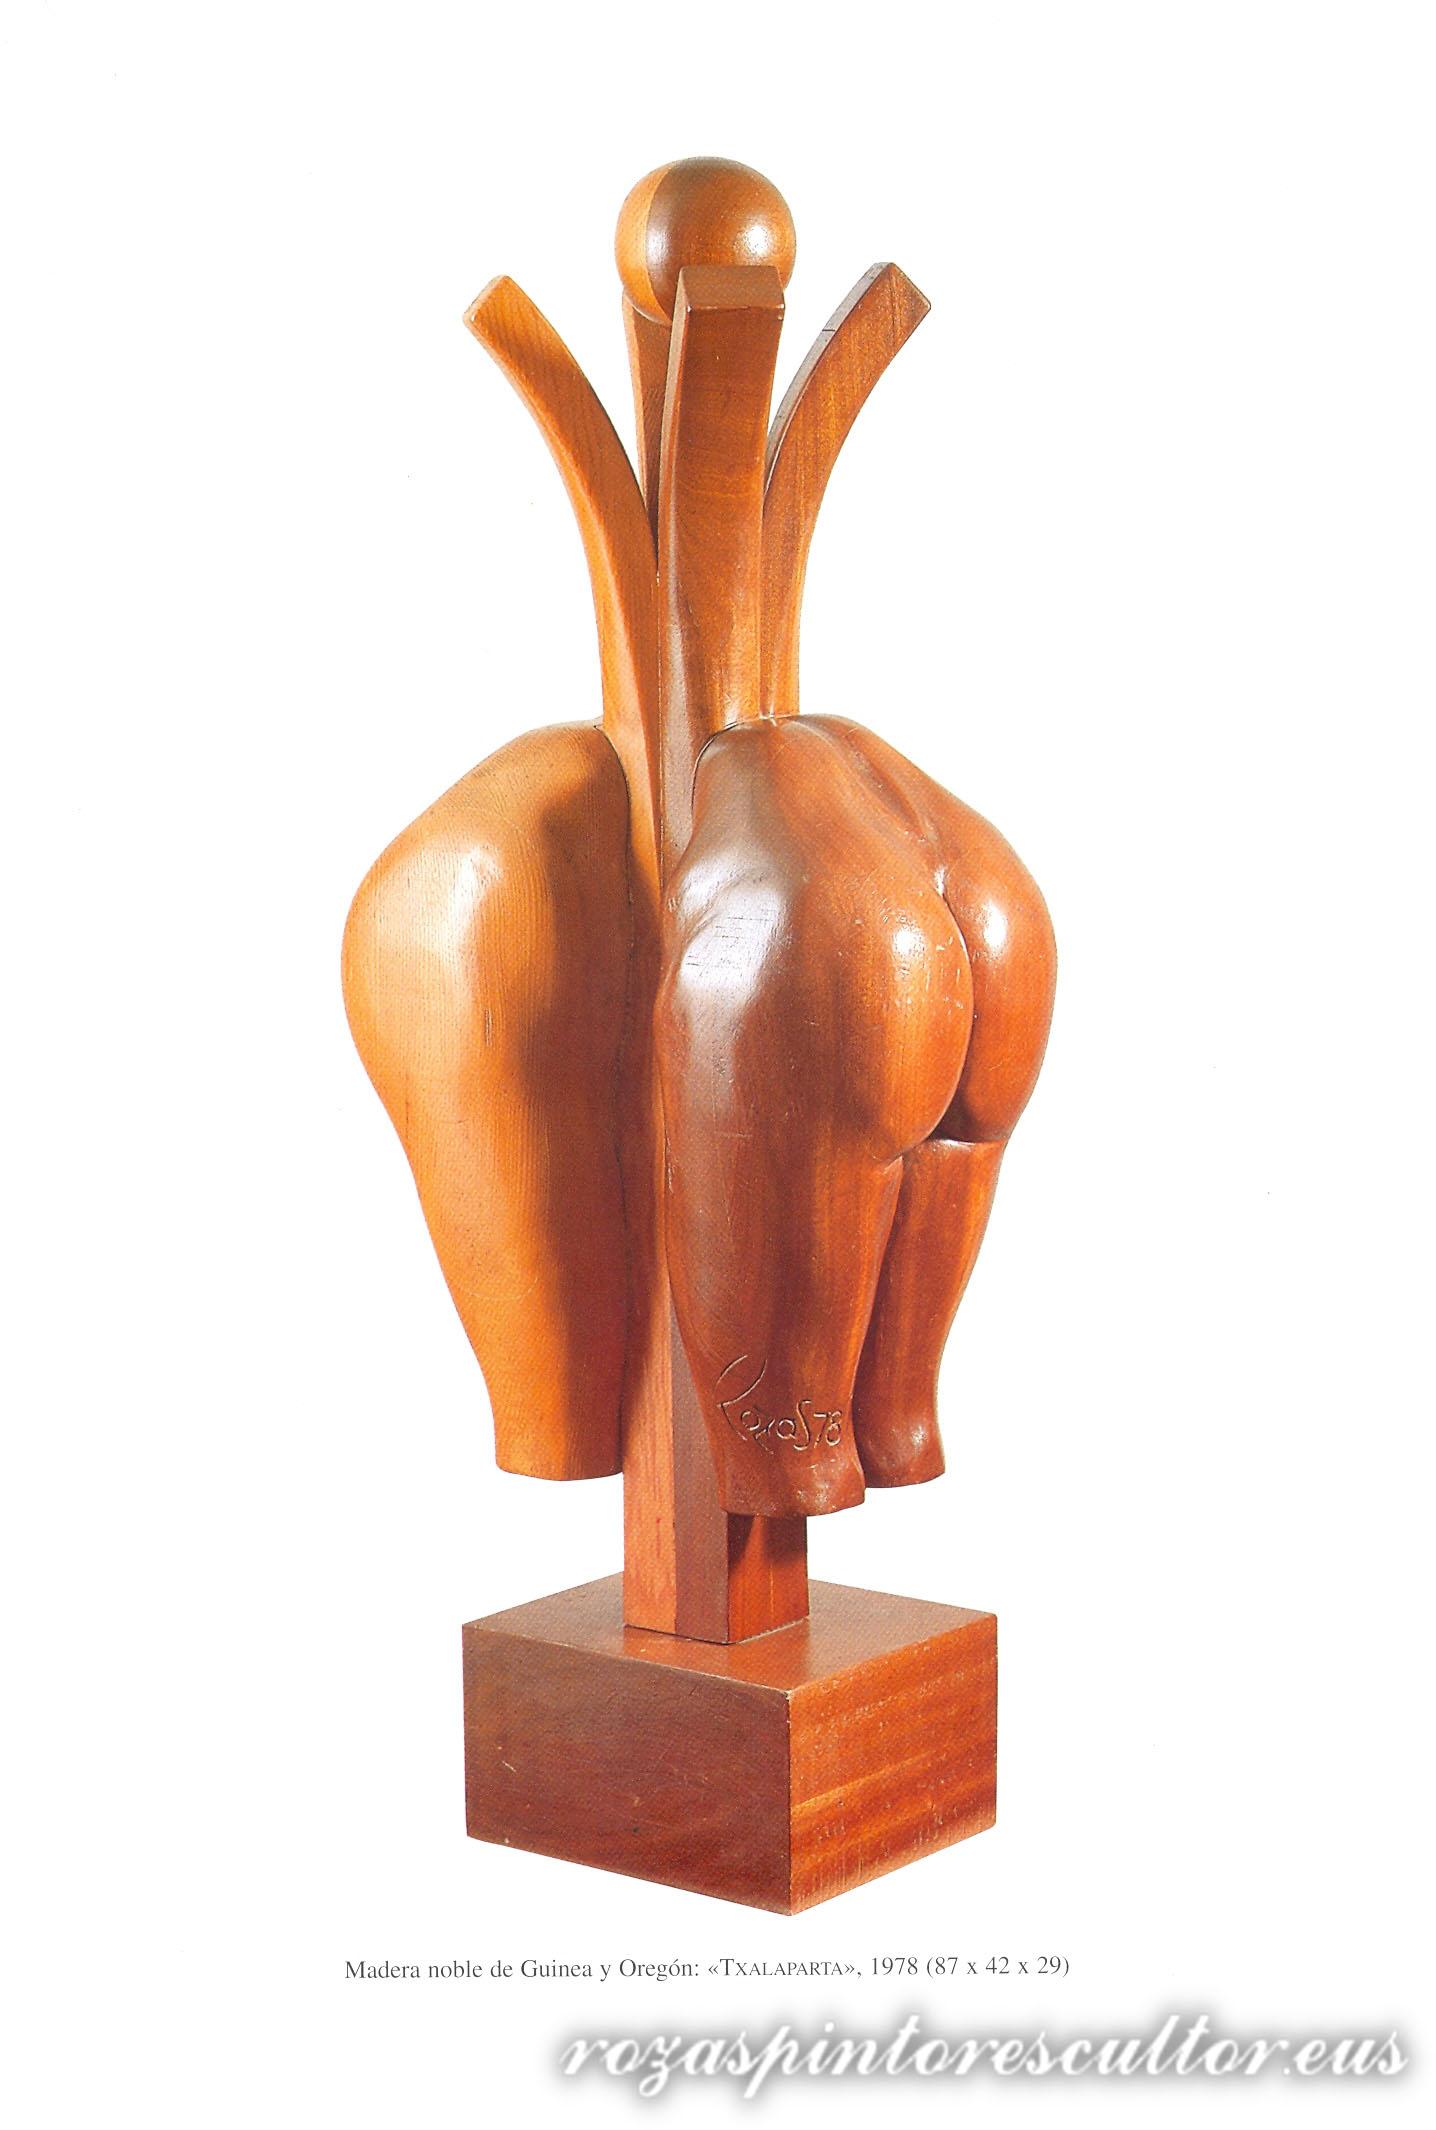 1978 Txalaparta-wooden musical instrument87x42x29